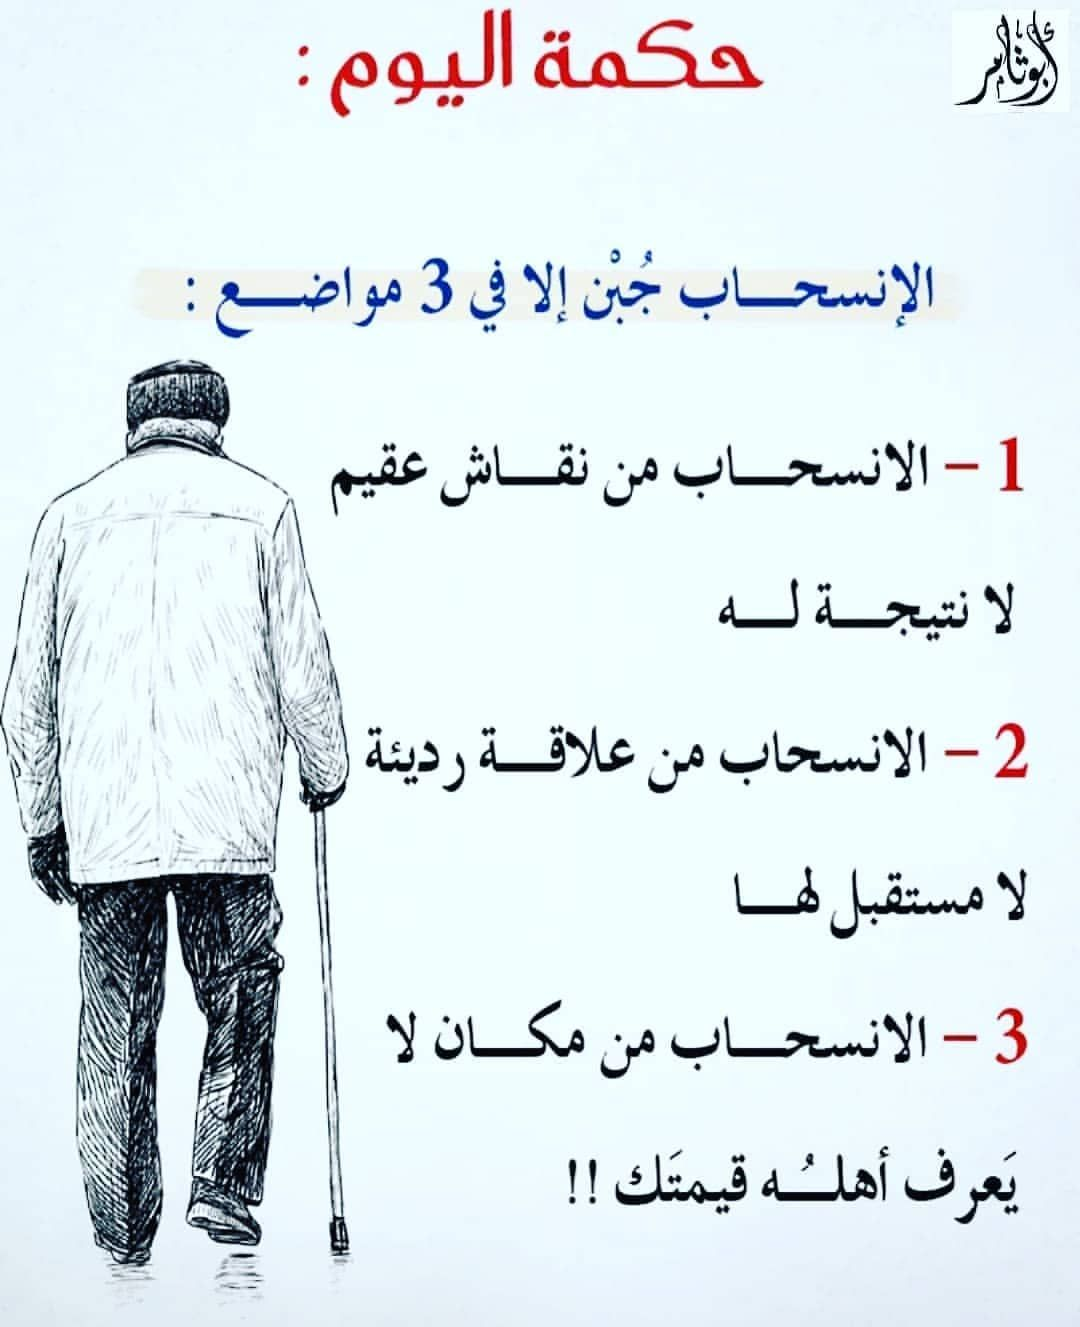 Pin By المرأة العربية On مقولات اعجبتني True Quotes Arabic Love Quotes Quotes